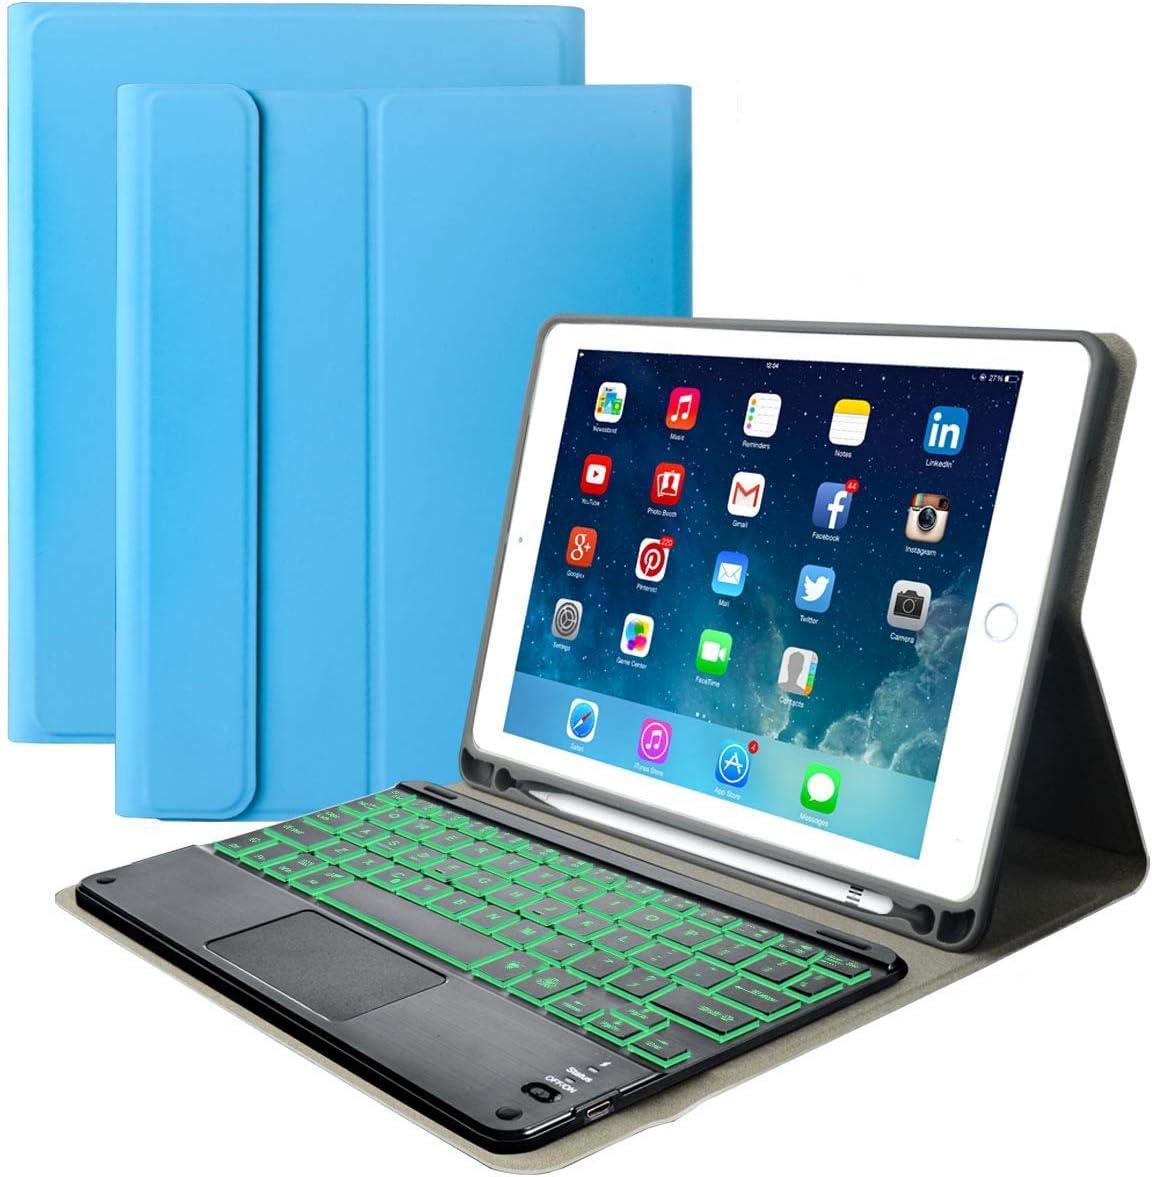 "iPad Keyboard Case for iPad 2018 (6th Gen) - iPad 2017 (5th Gen) - iPad Pro 9.7 - iPad Air 2 -Eoso iPad Cover with Keyboard Built-in Touchpad & Pencil Holder (9.7"", Blue with Backlit Keyboard)"